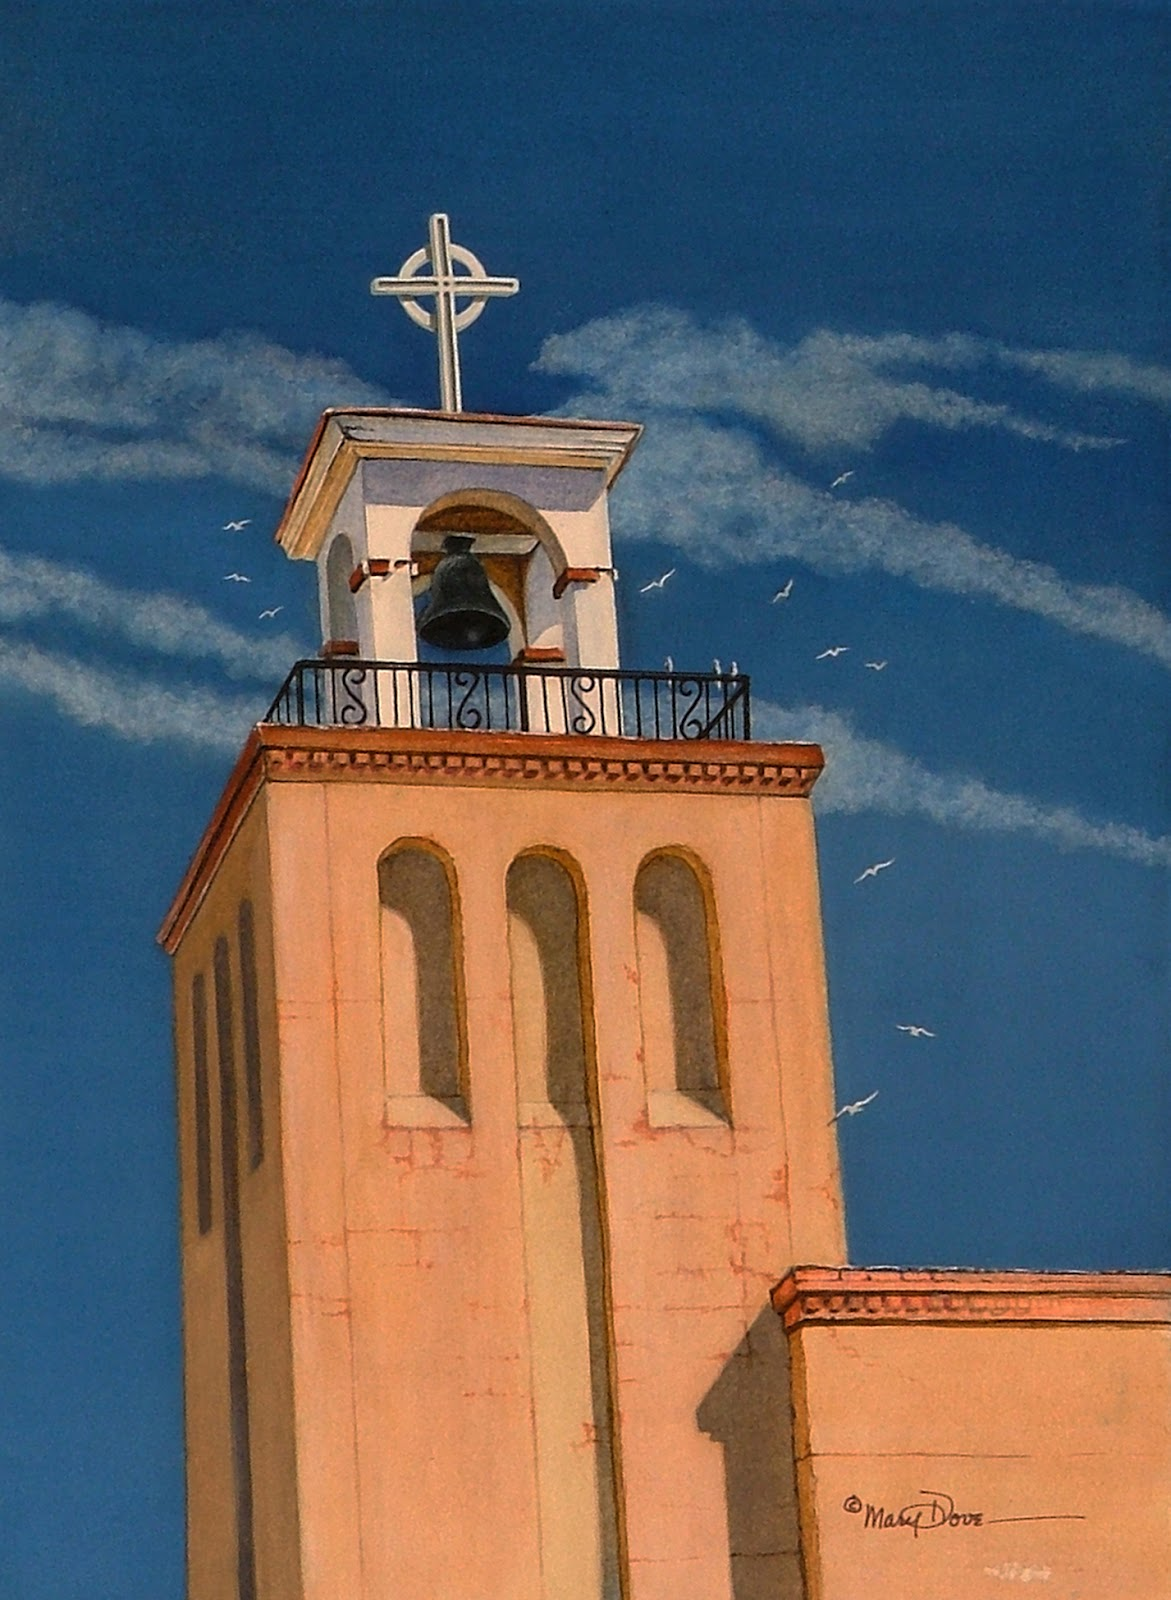 http://2.bp.blogspot.com/-qzF08Ml0zRE/T0b2fPDgJLI/AAAAAAAAADQ/zwzYoQipoqM/s1600/MD_2_Santa+Bell+Tower_Watercolor.jpg.jpg